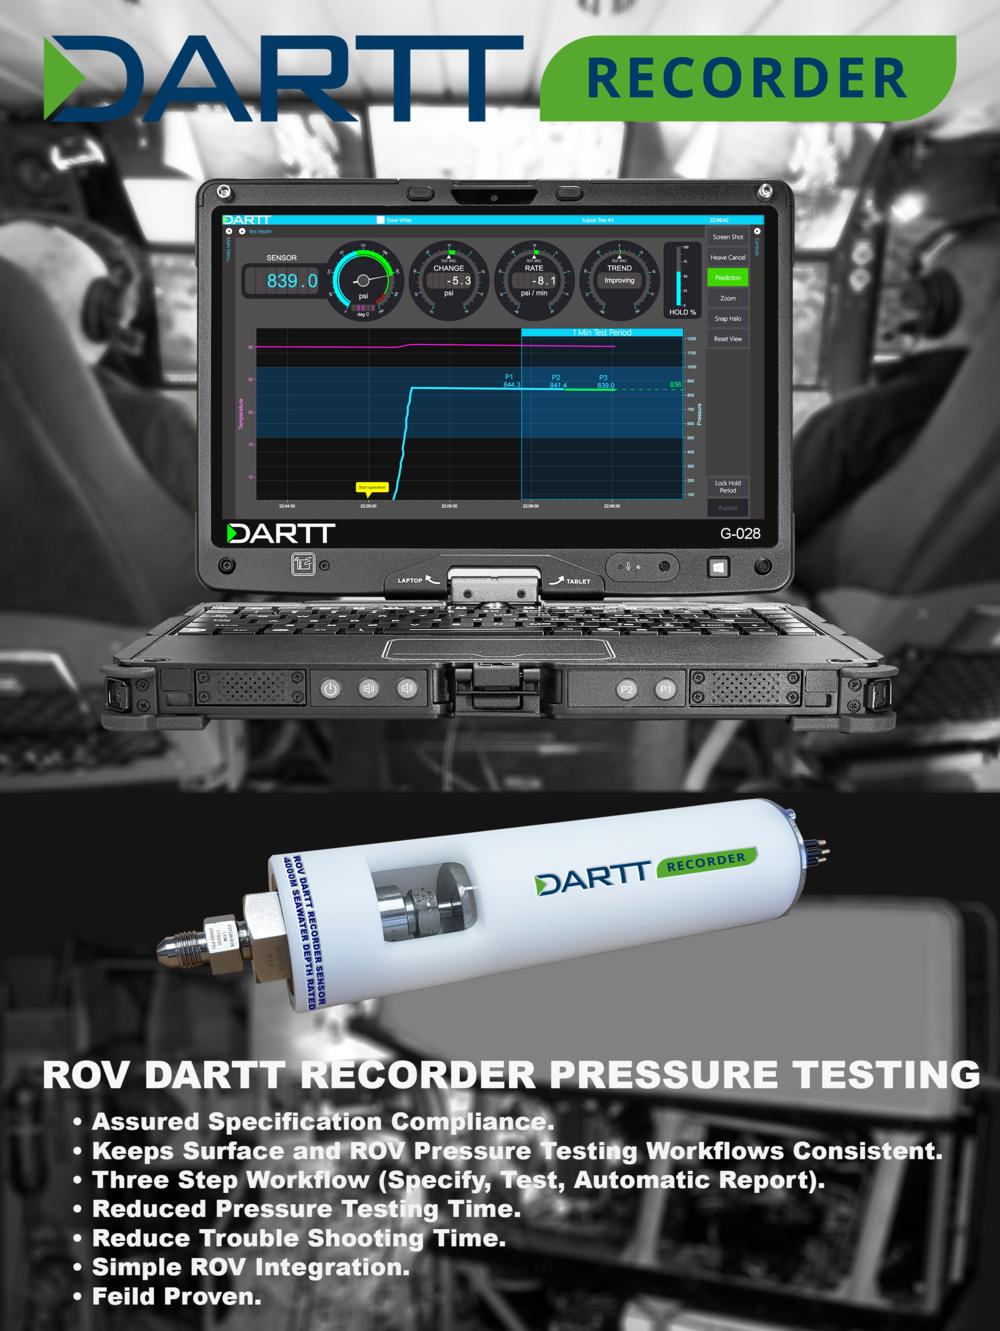 ROV Presssure Testing DARTT Recorder